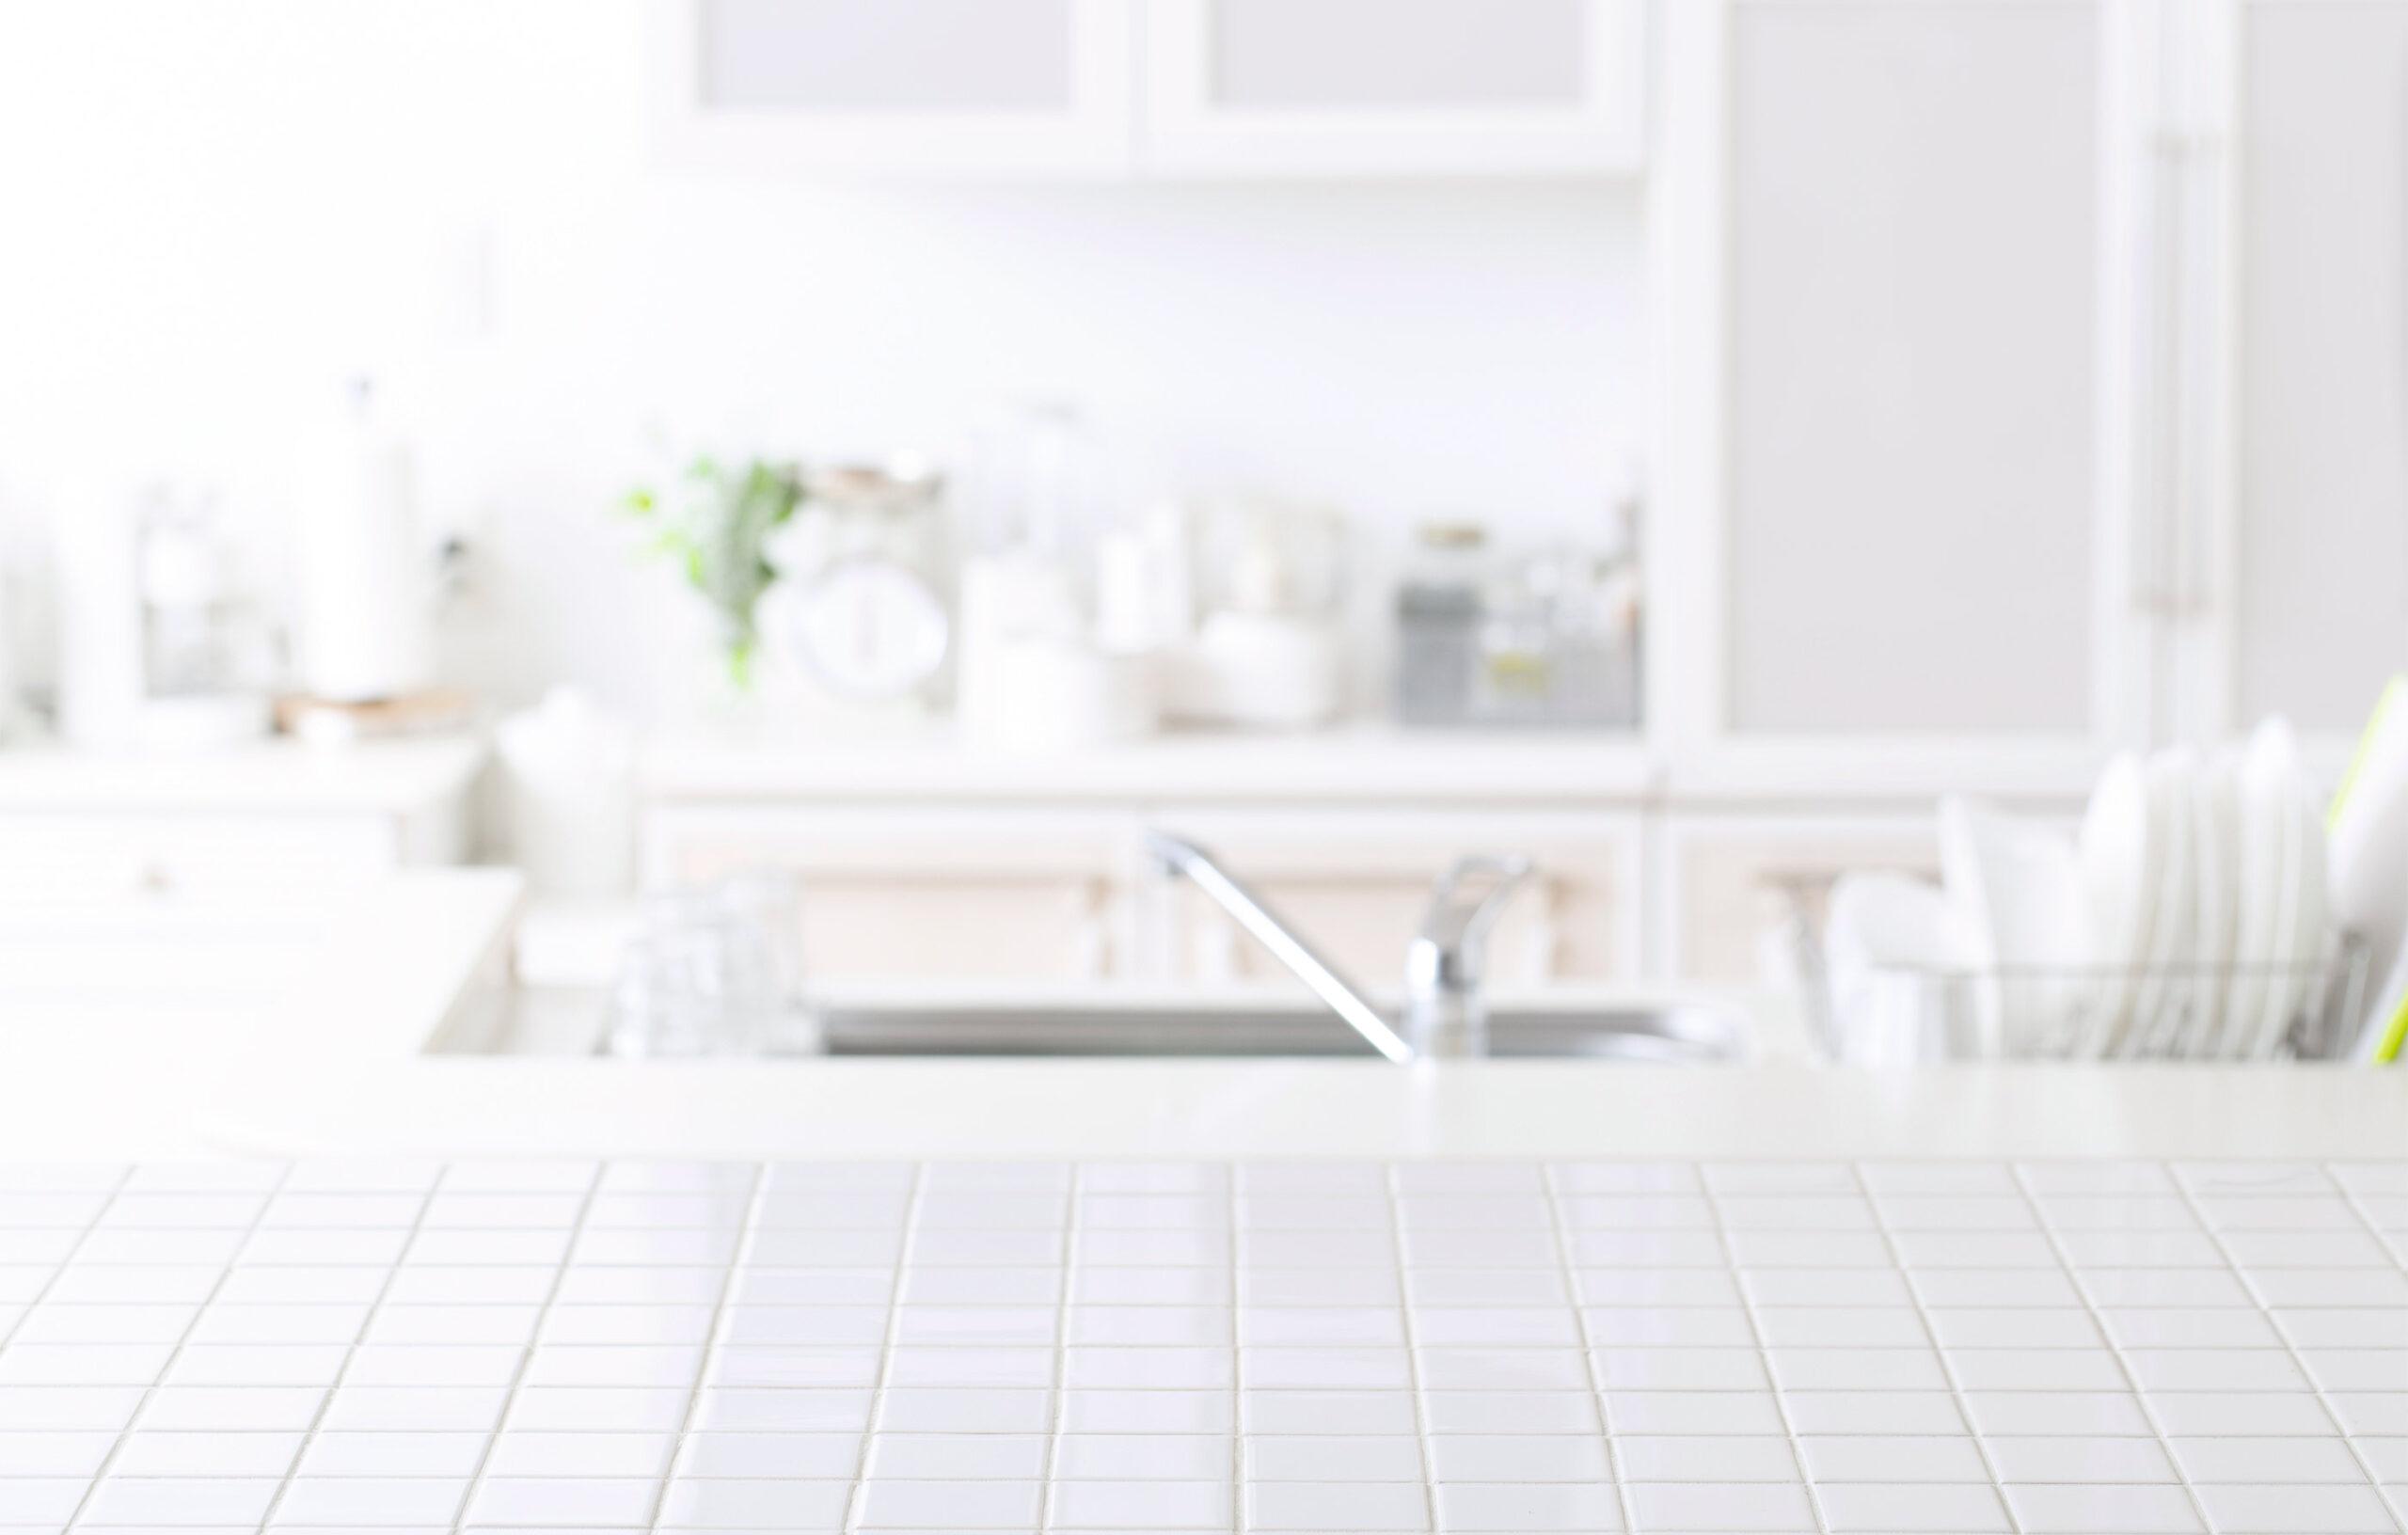 slider-cocina-1-scaled Rayen | Soluciones innovadoras para el hogar | Cocina | Rayen.com